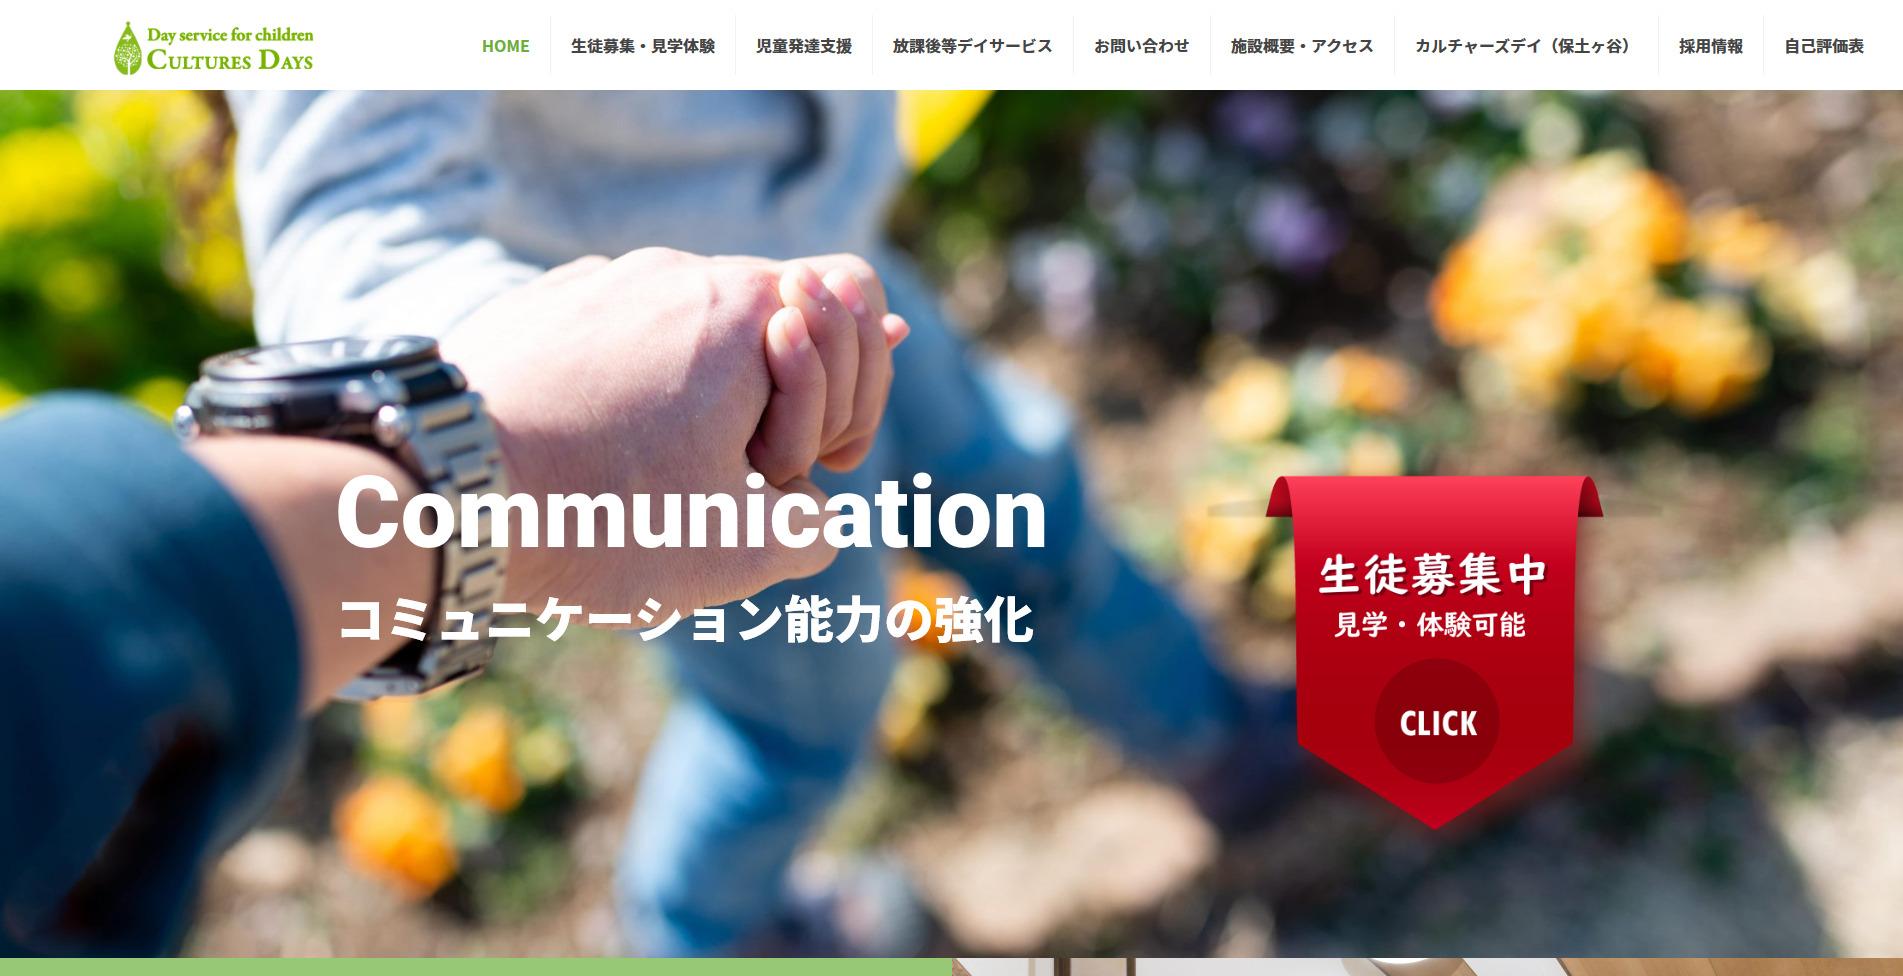 Screenshot_神奈川県C社様